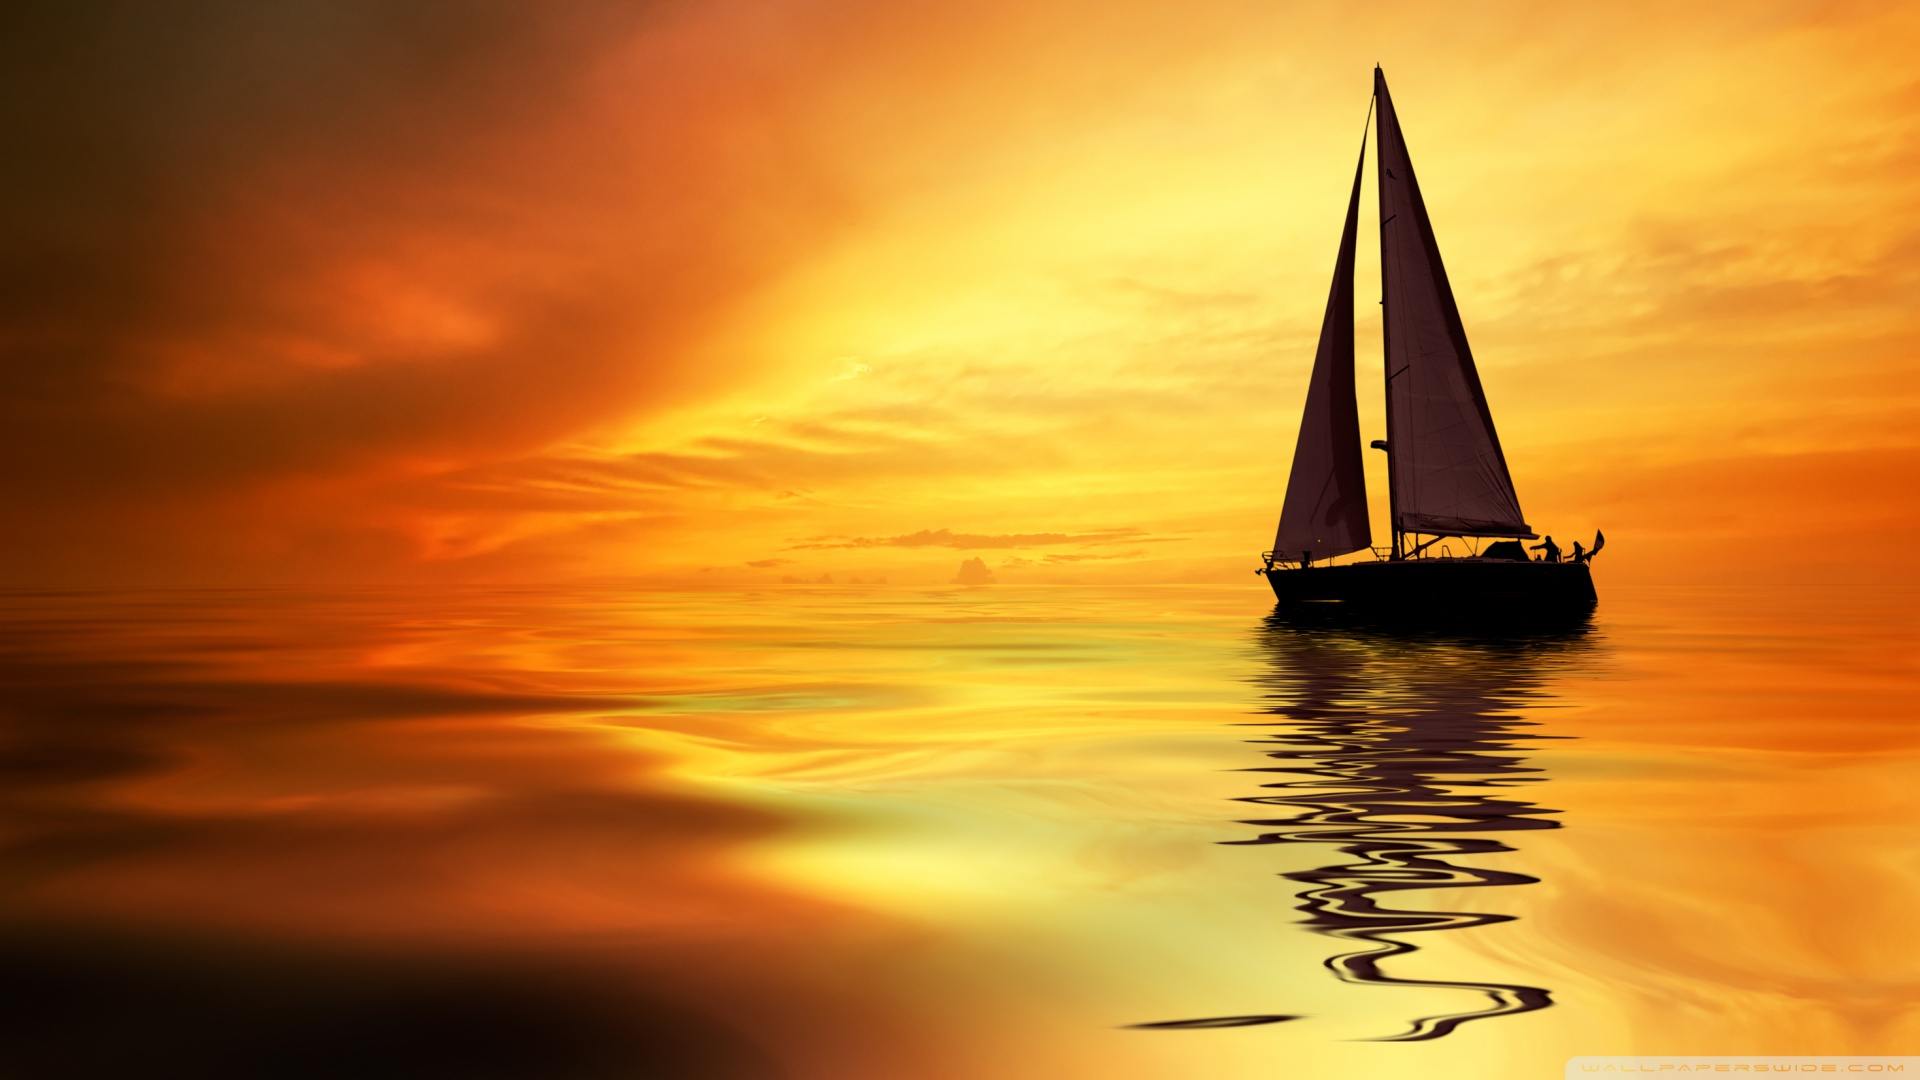 Boat Wallpaper 1920x1080 39188